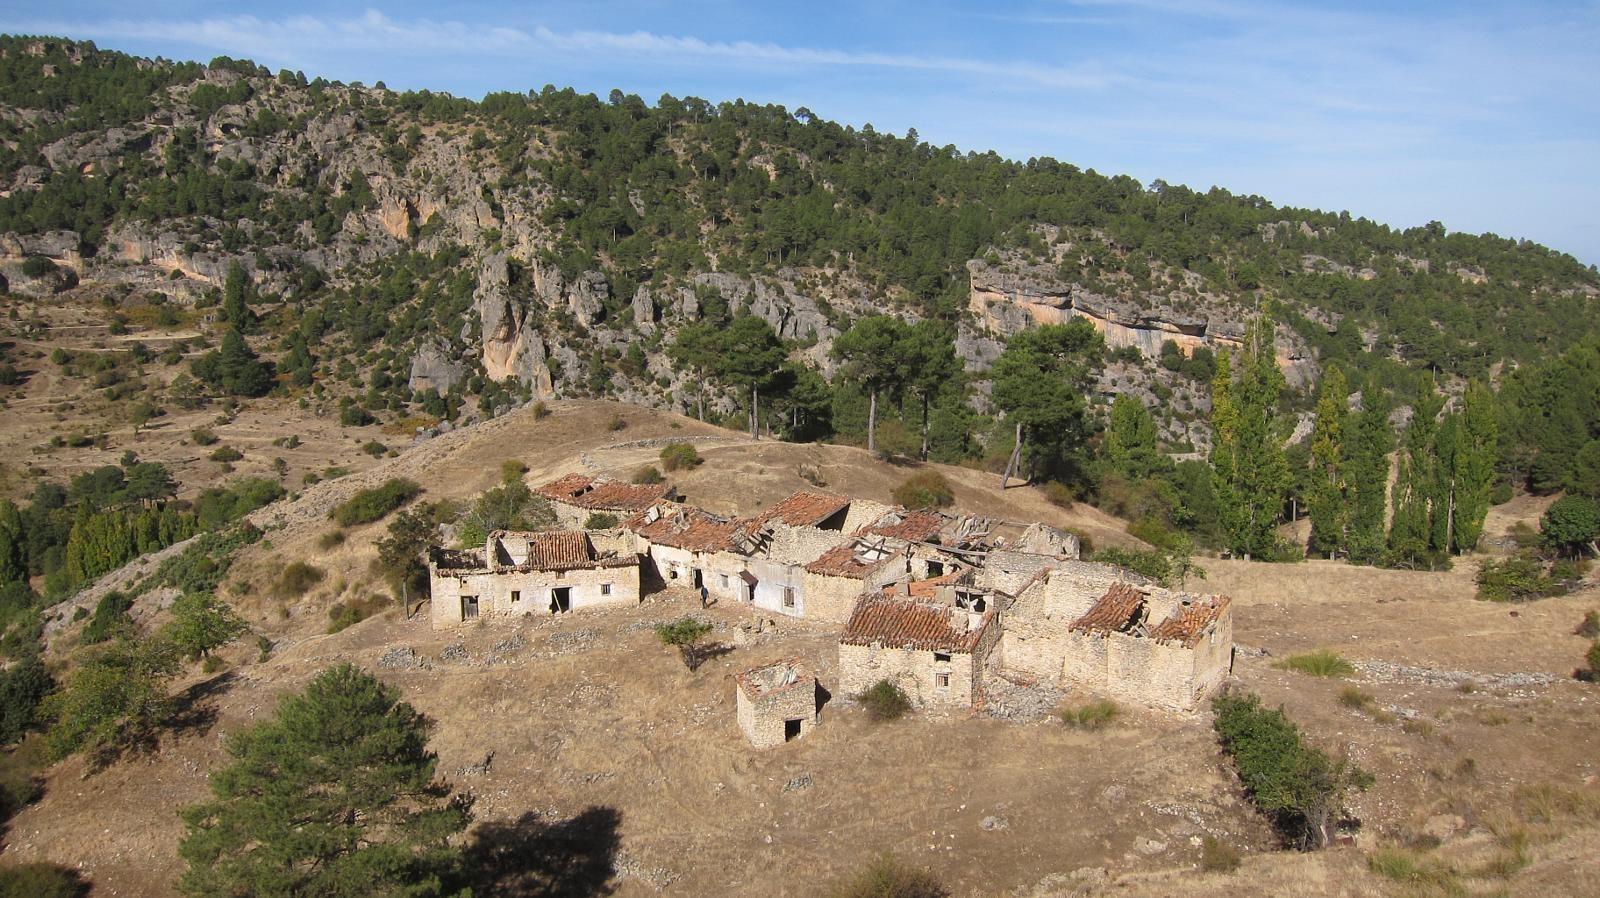 Las aldeas perdidas de la Sierra de Segura